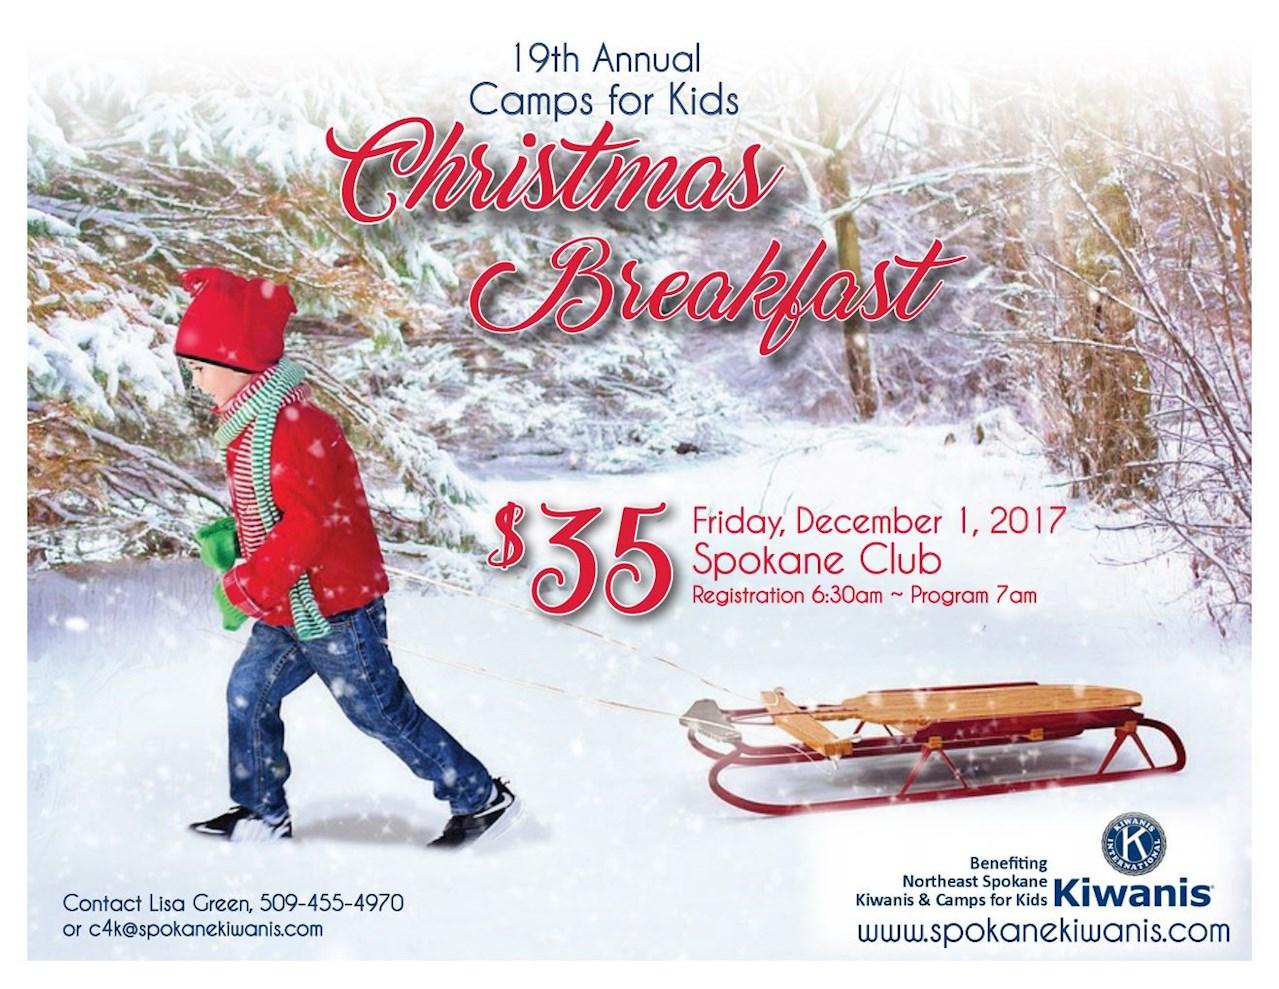 Camps for Kids Christmas Breakfast December 1st